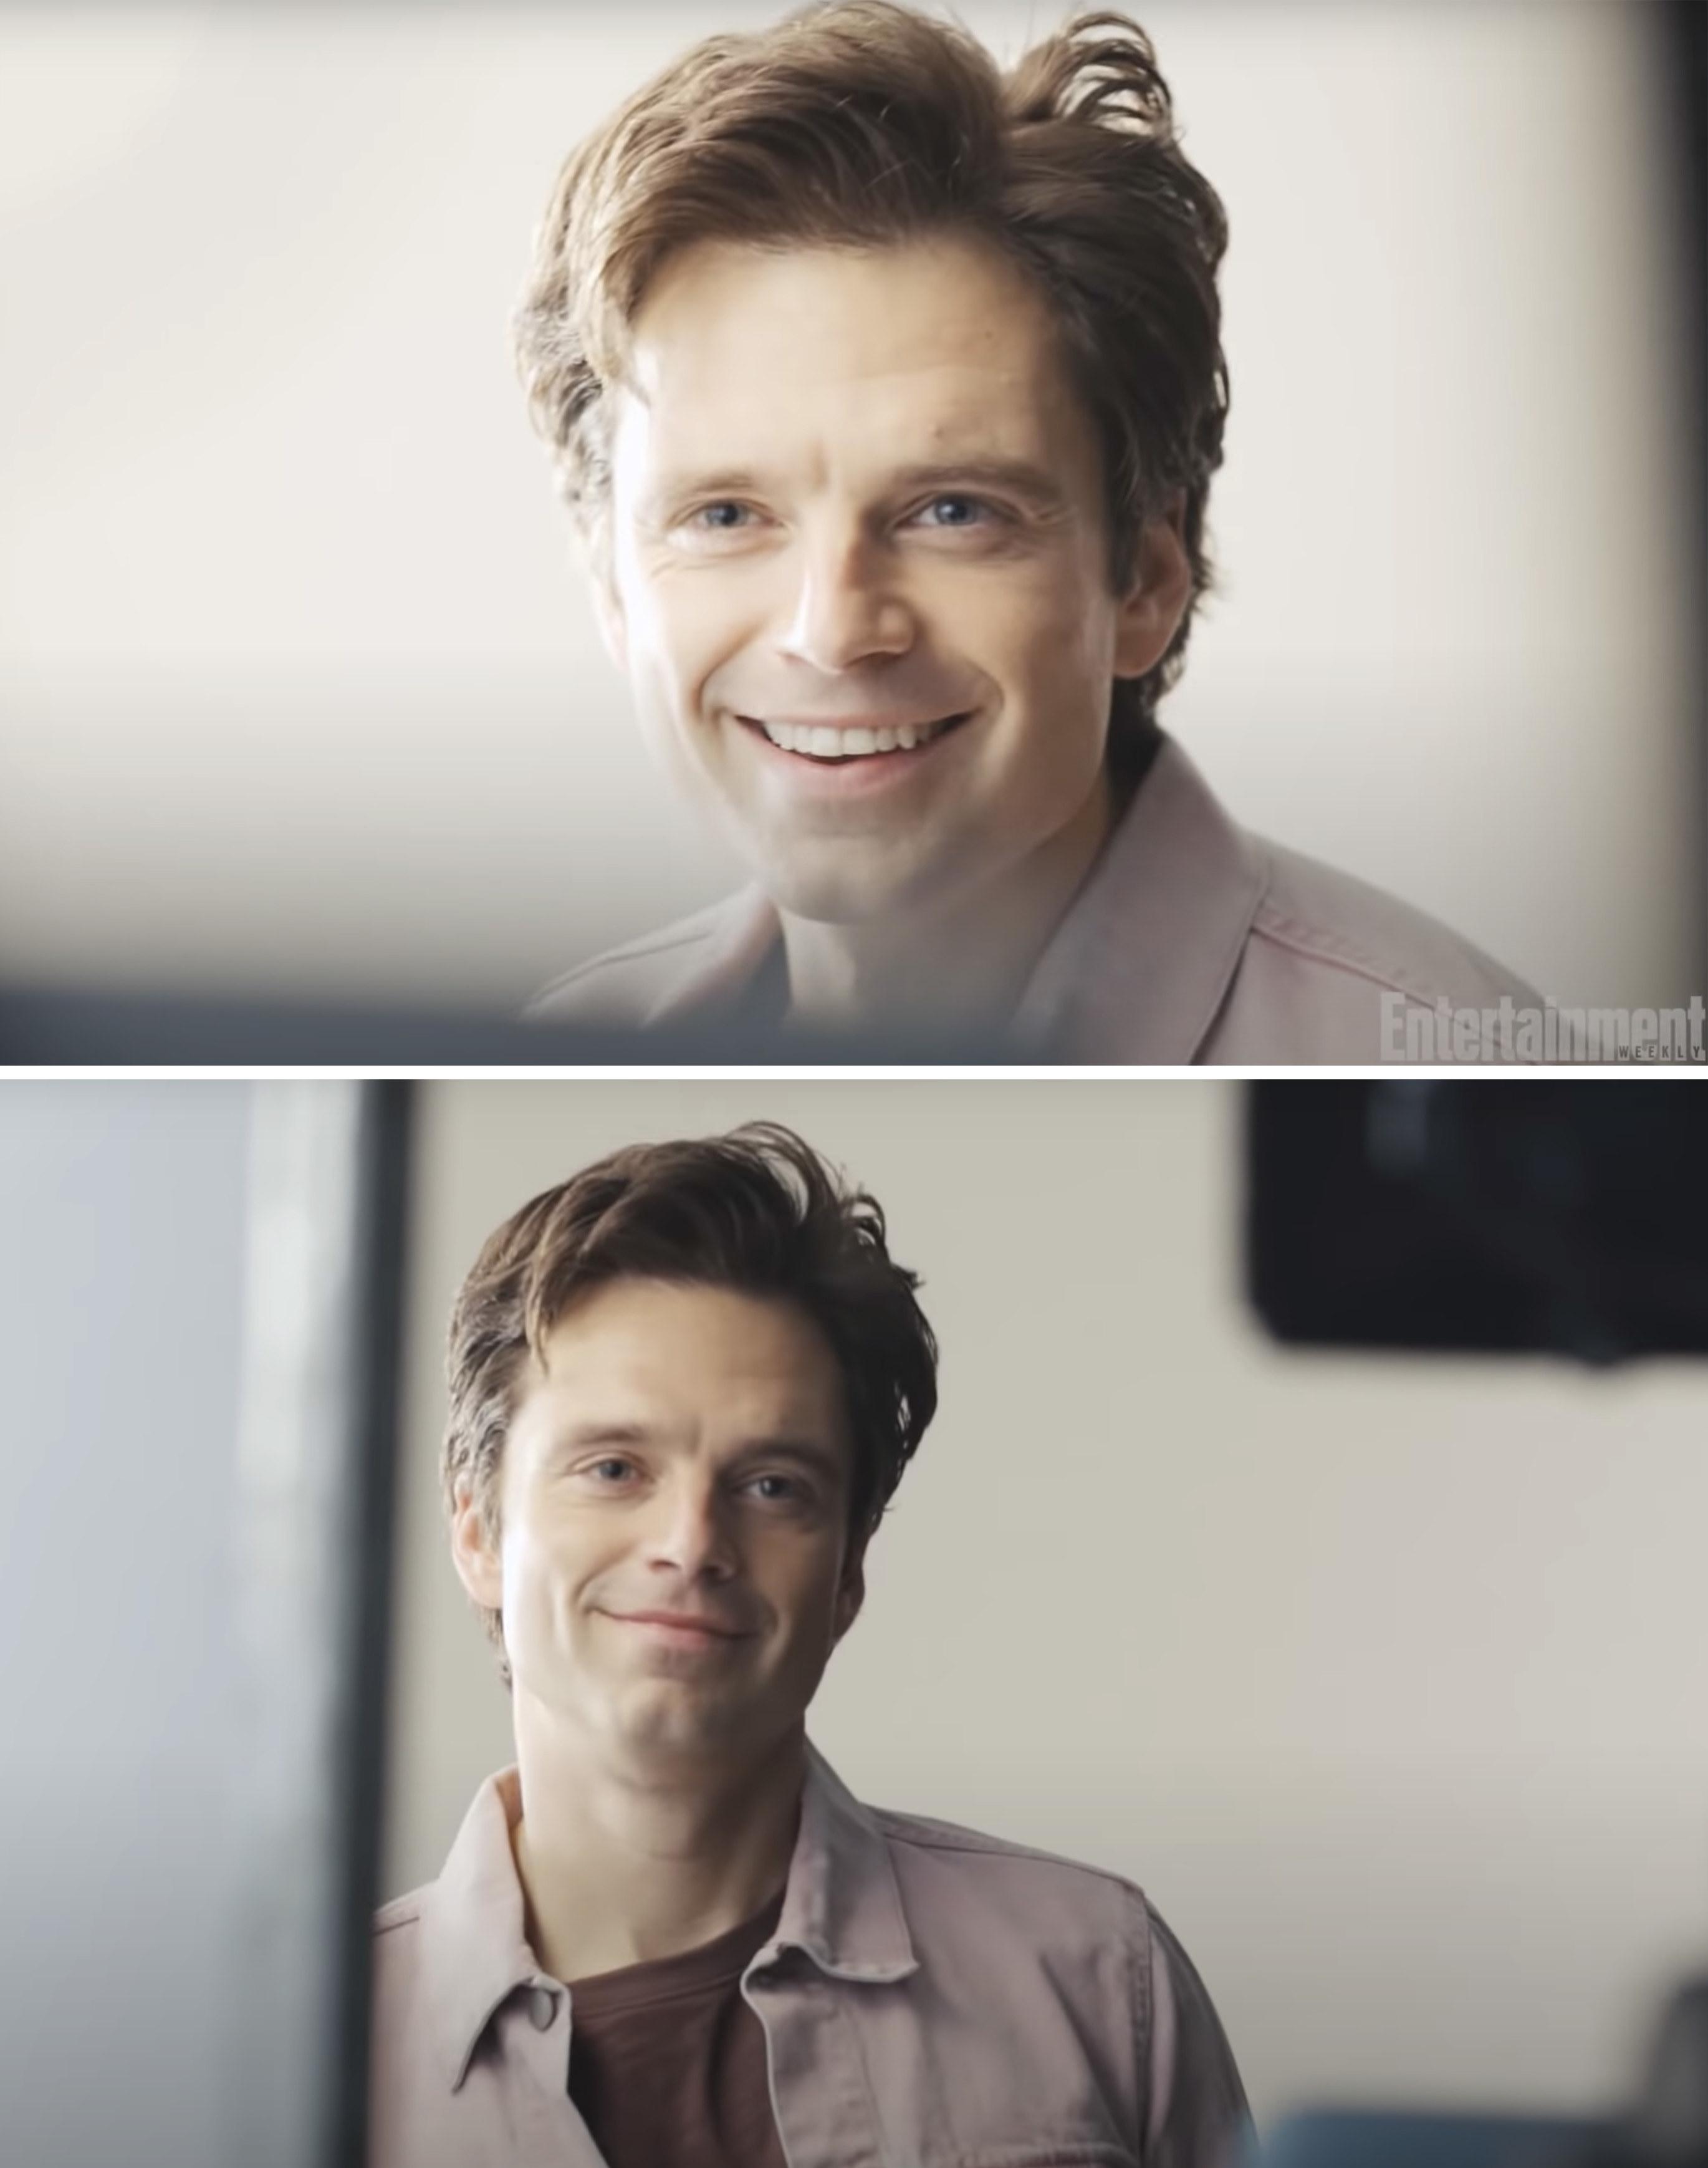 Sebastian smiling while taking photos